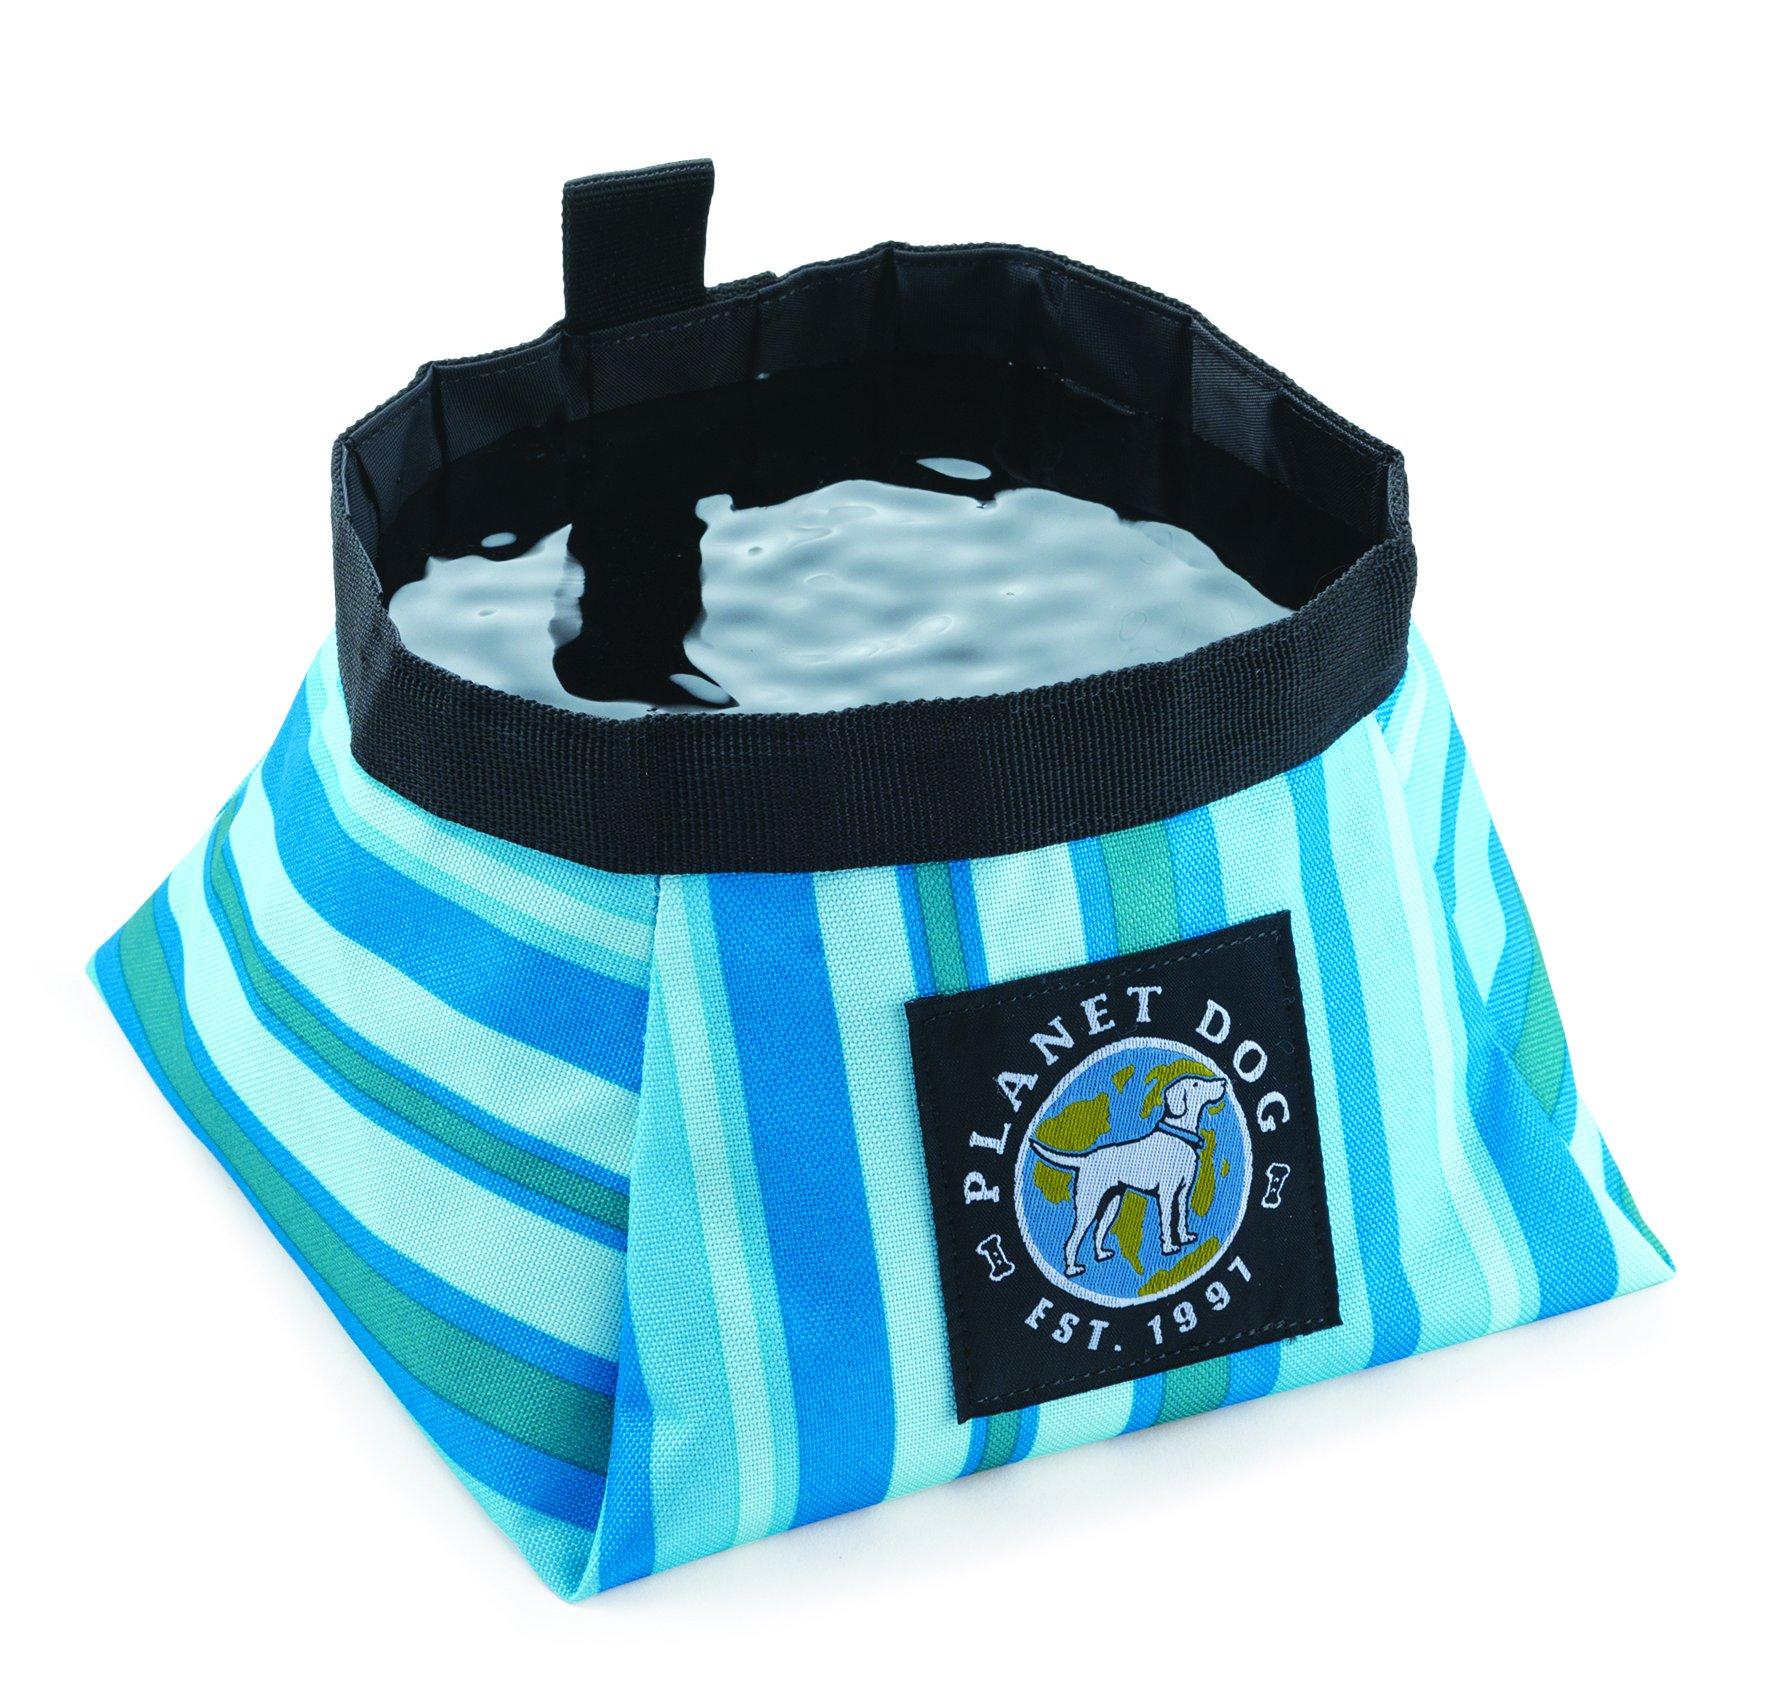 Planet Dog Travel Bowl, Large, Seaside Blue by Planet Dog